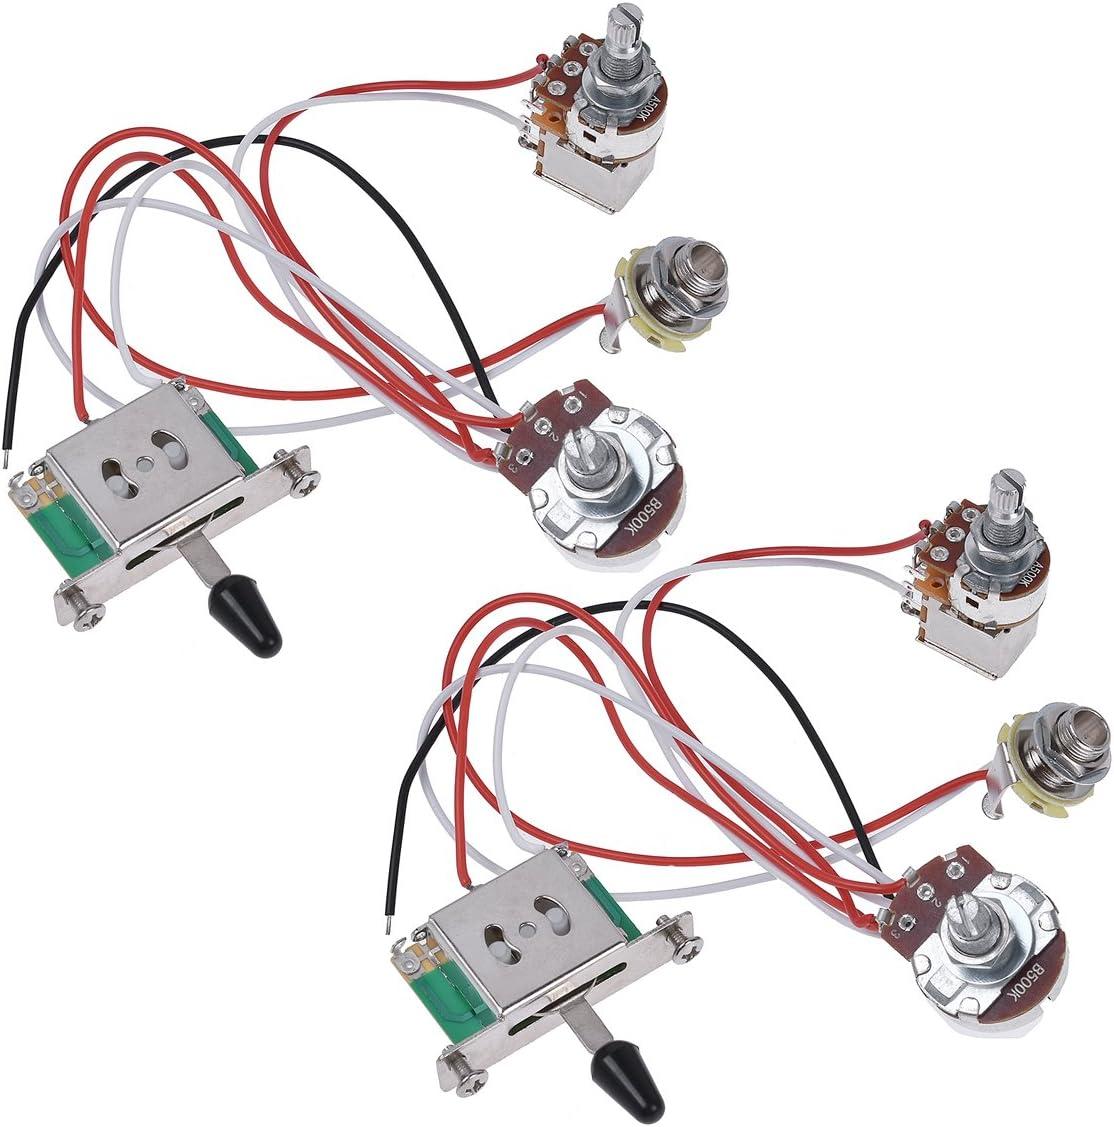 amazon.com: kmise electric guitar wiring harness prewired kit 3 way toggle  switch 1 volume 1 tone 500k pots jack 2 set: musical instruments  amazon.com